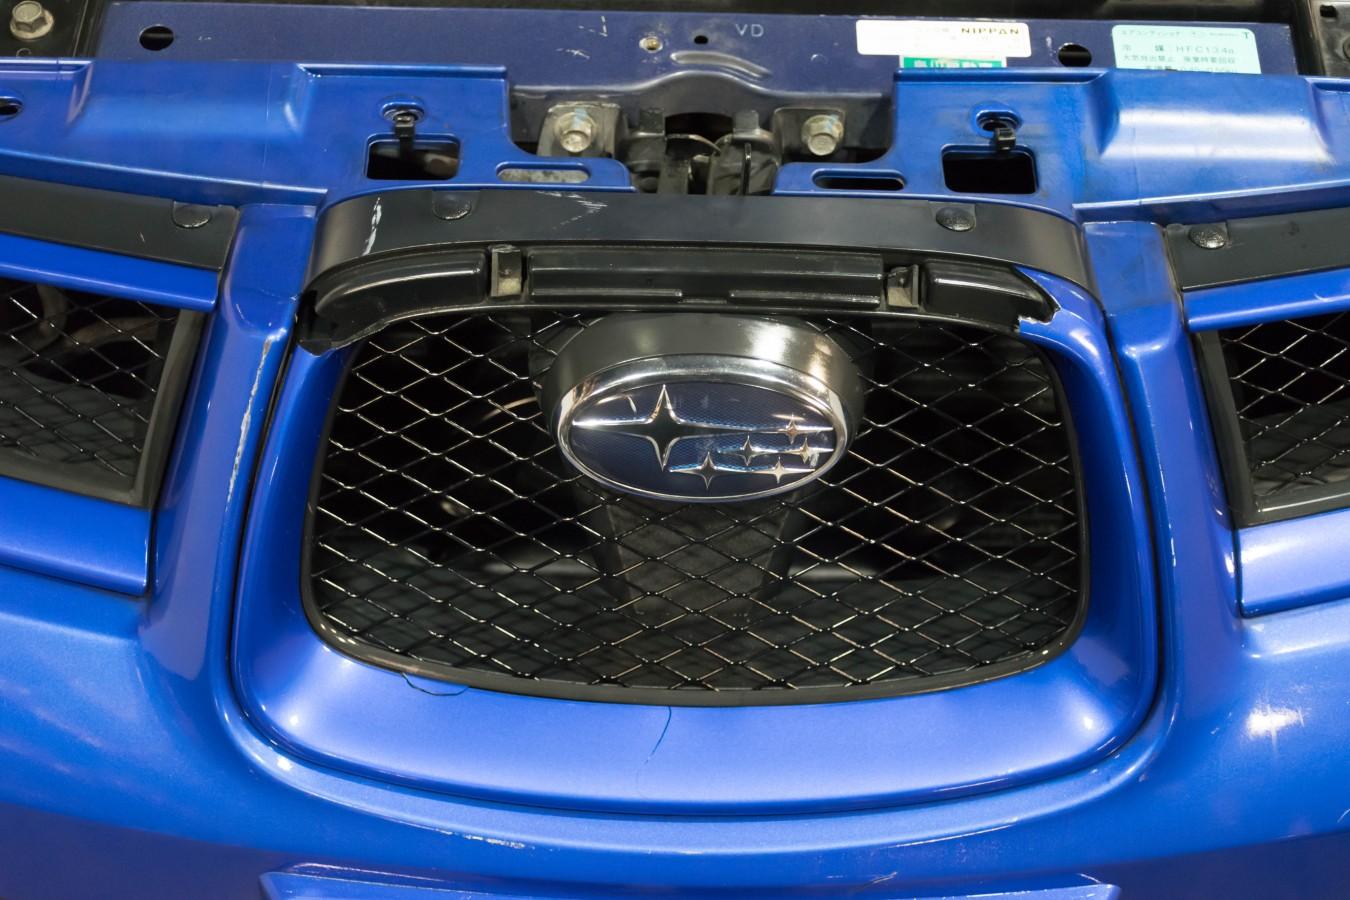 Used Subaru Wrx For Sale >> 2006 2007 Impreza WRX STI Version 9 Hawkeye Nose Cut in World Rally Blue With a Beautiful Front ...